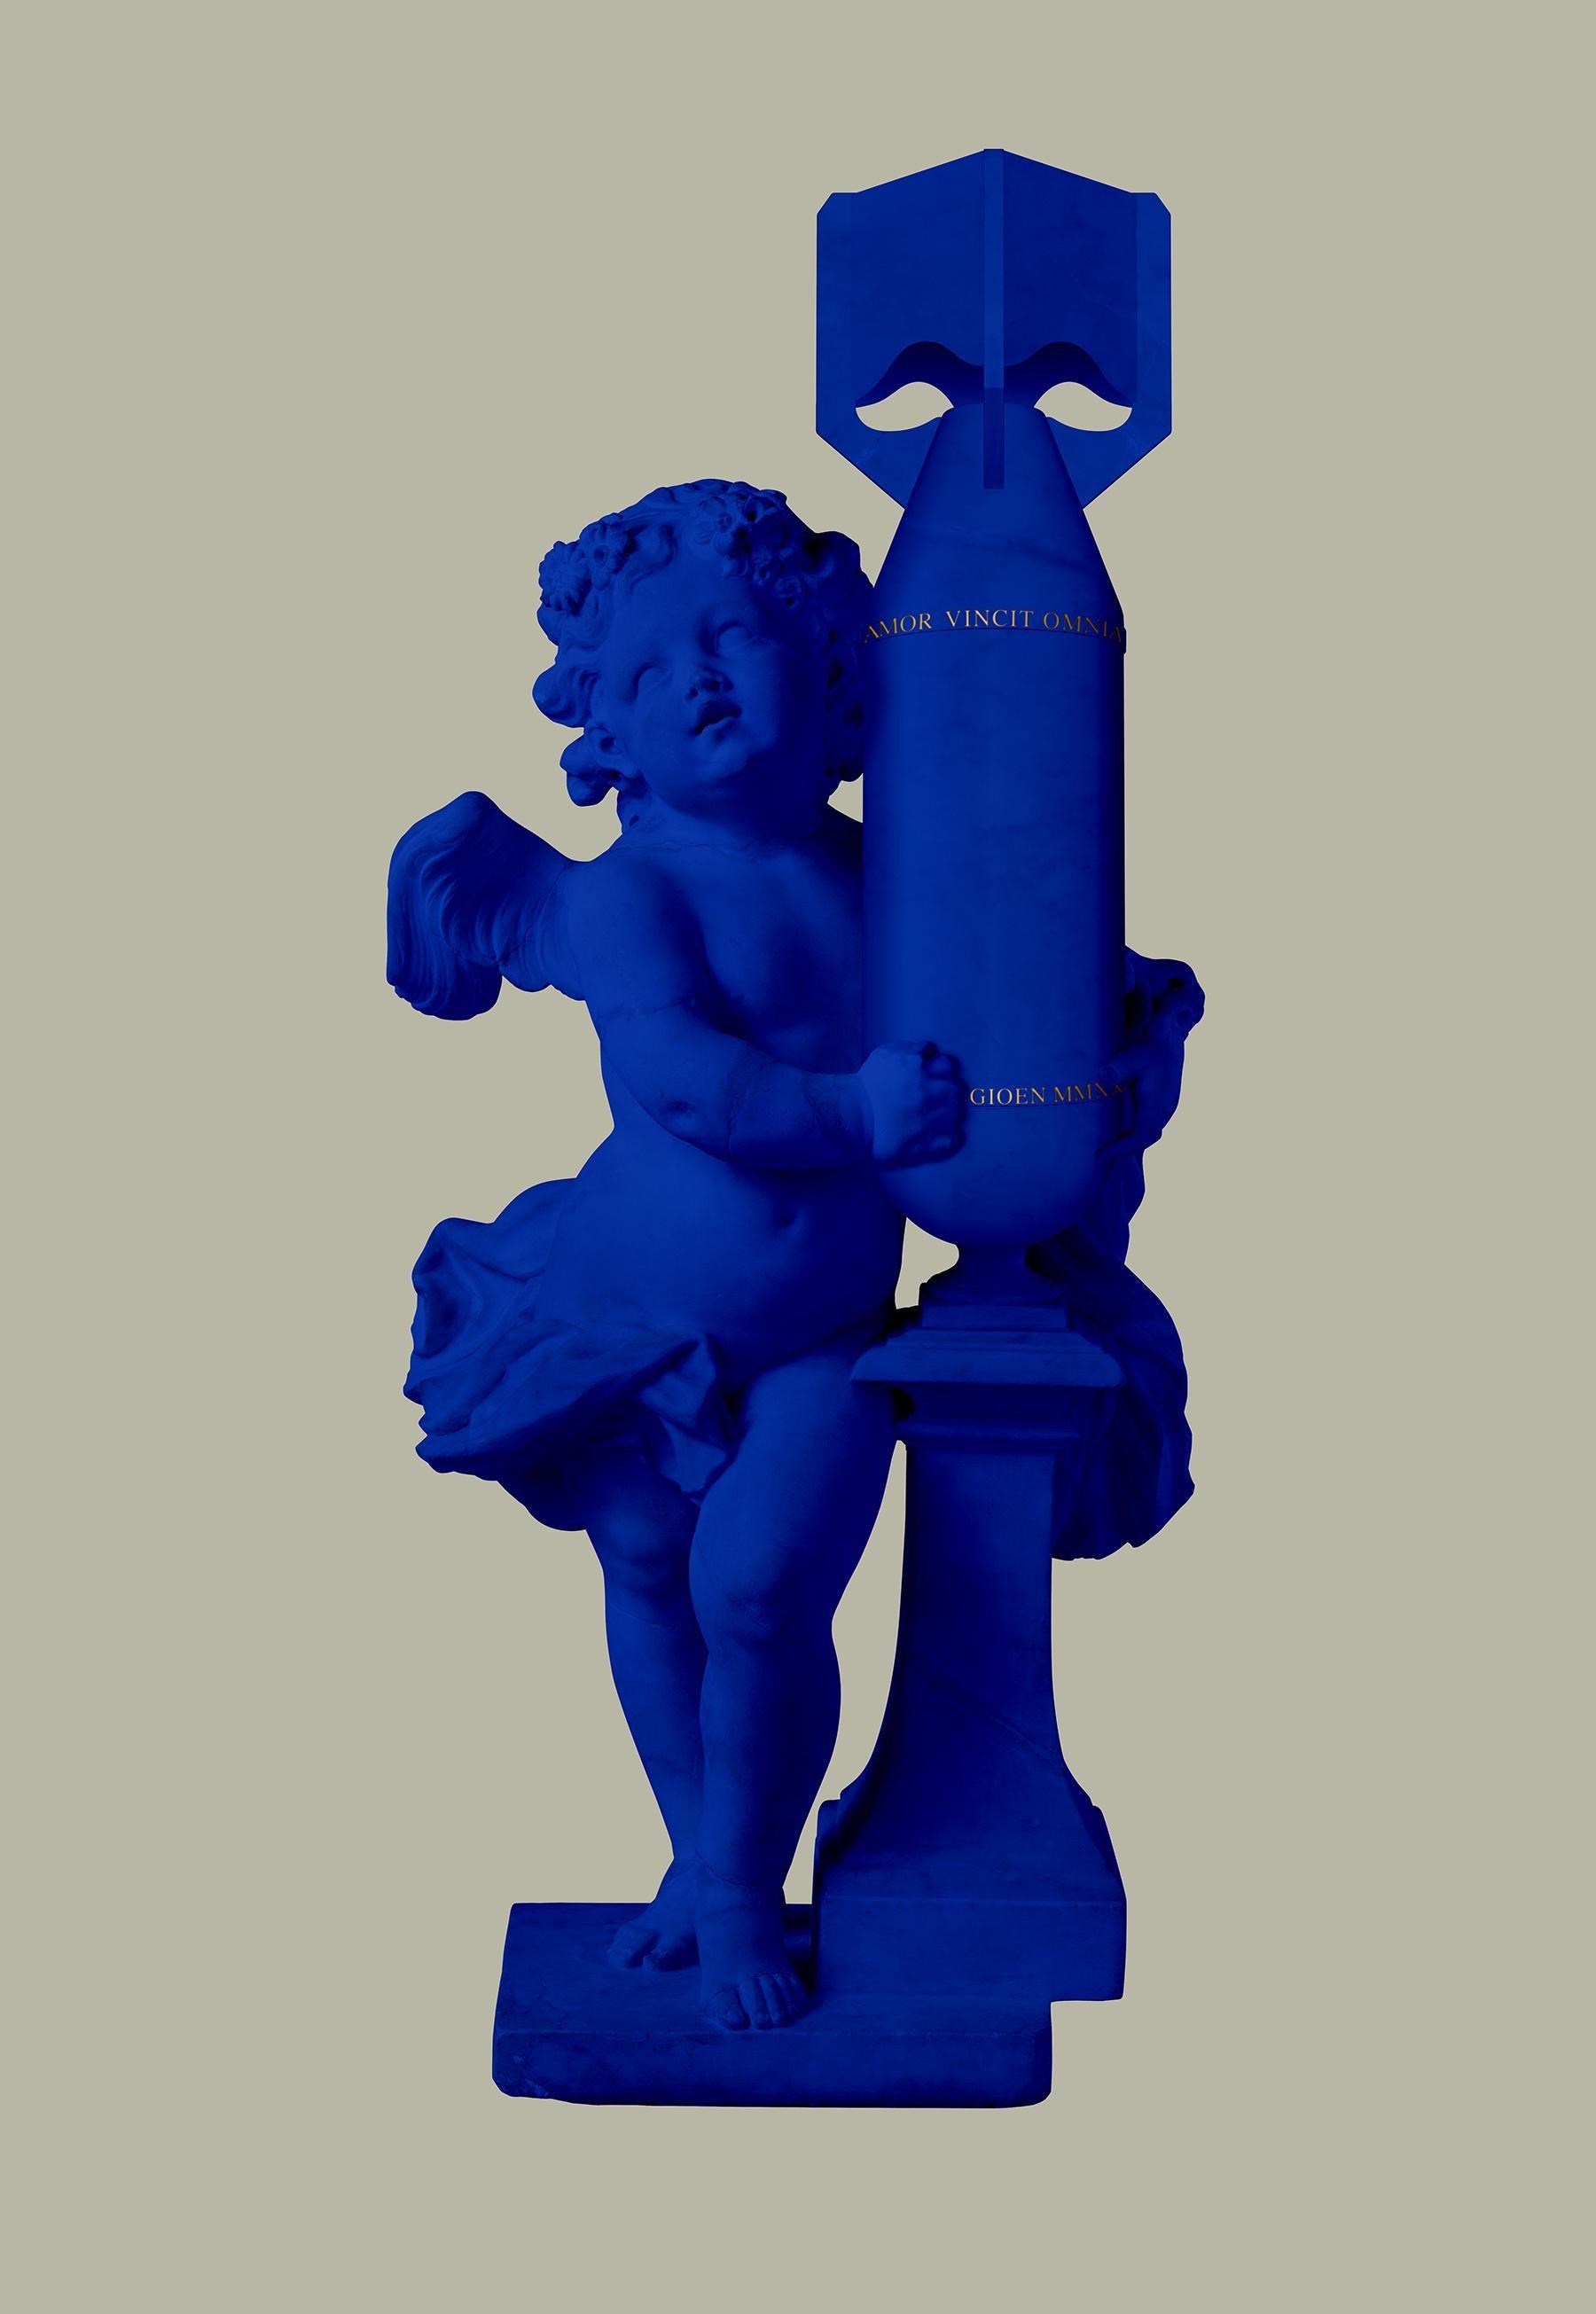 CUPID (AMOR VINCIT OMNIA) BLUE